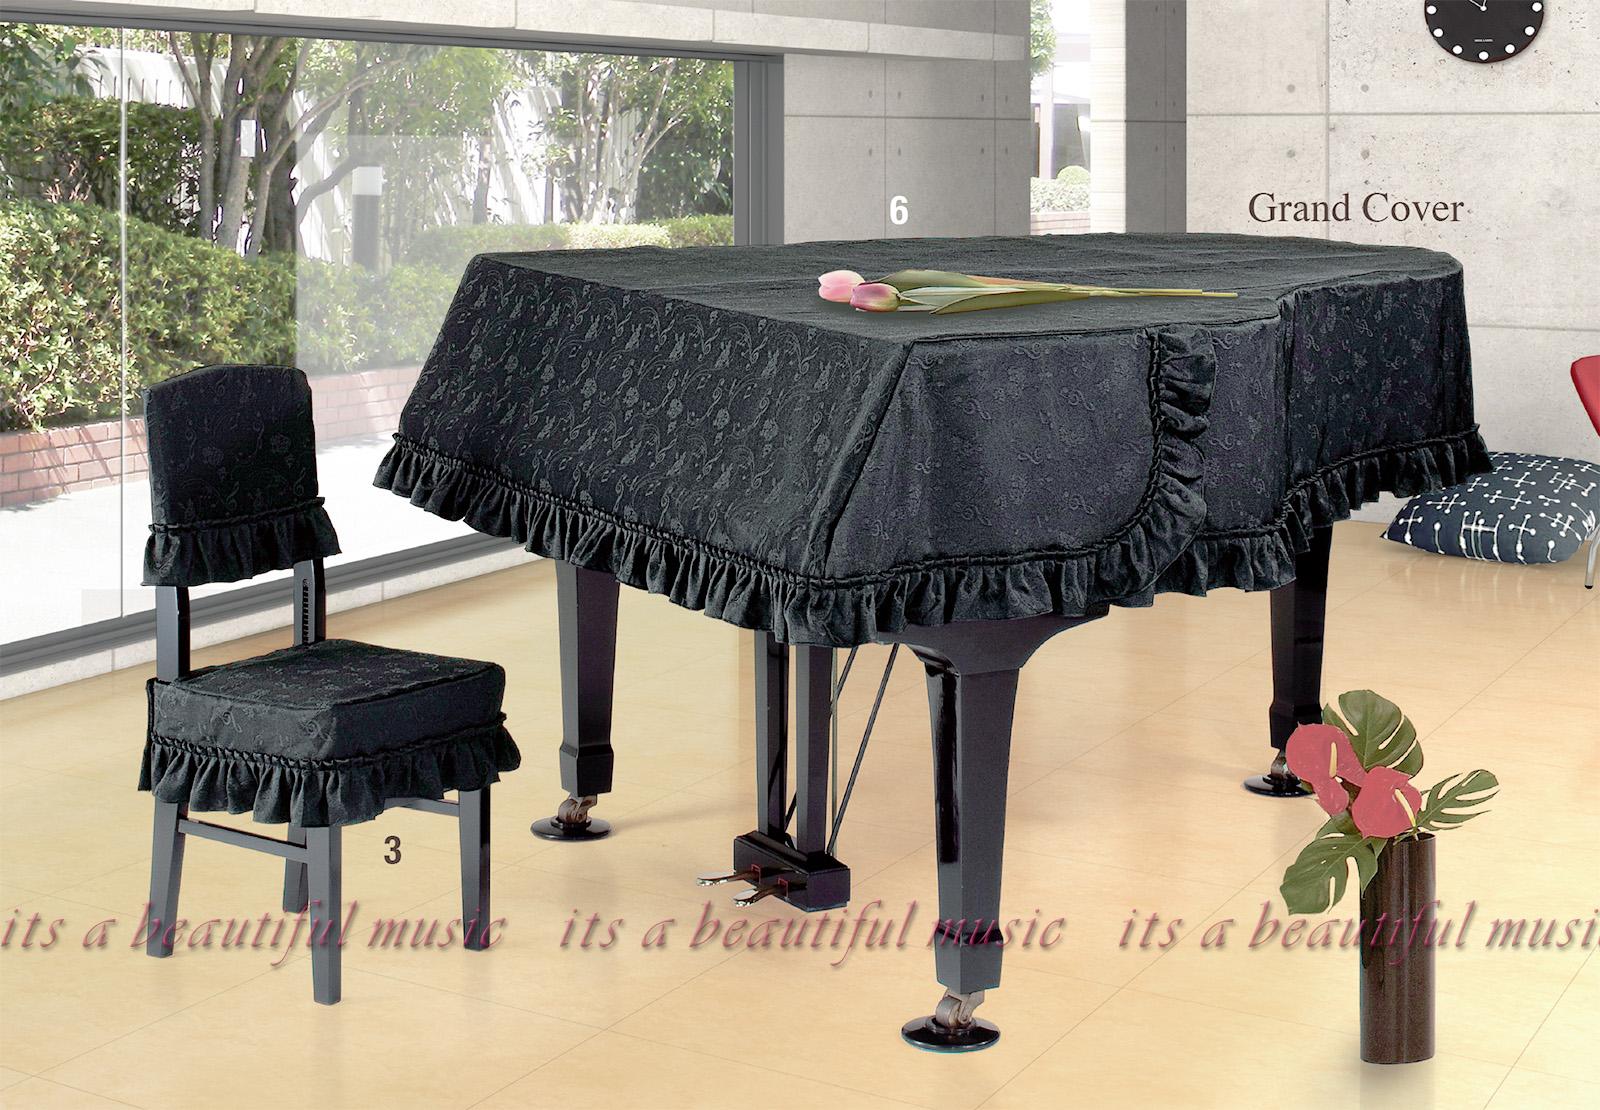 【its】レビューでもれなく高級クロス同梱!グランドピアノカバー アルプスG-MK「ワッシャー加工素材に音符と花の柄」【奥行150~160cm未満/A1/GB1K/GM12/G-156等】(アルプスMKシリーズ)